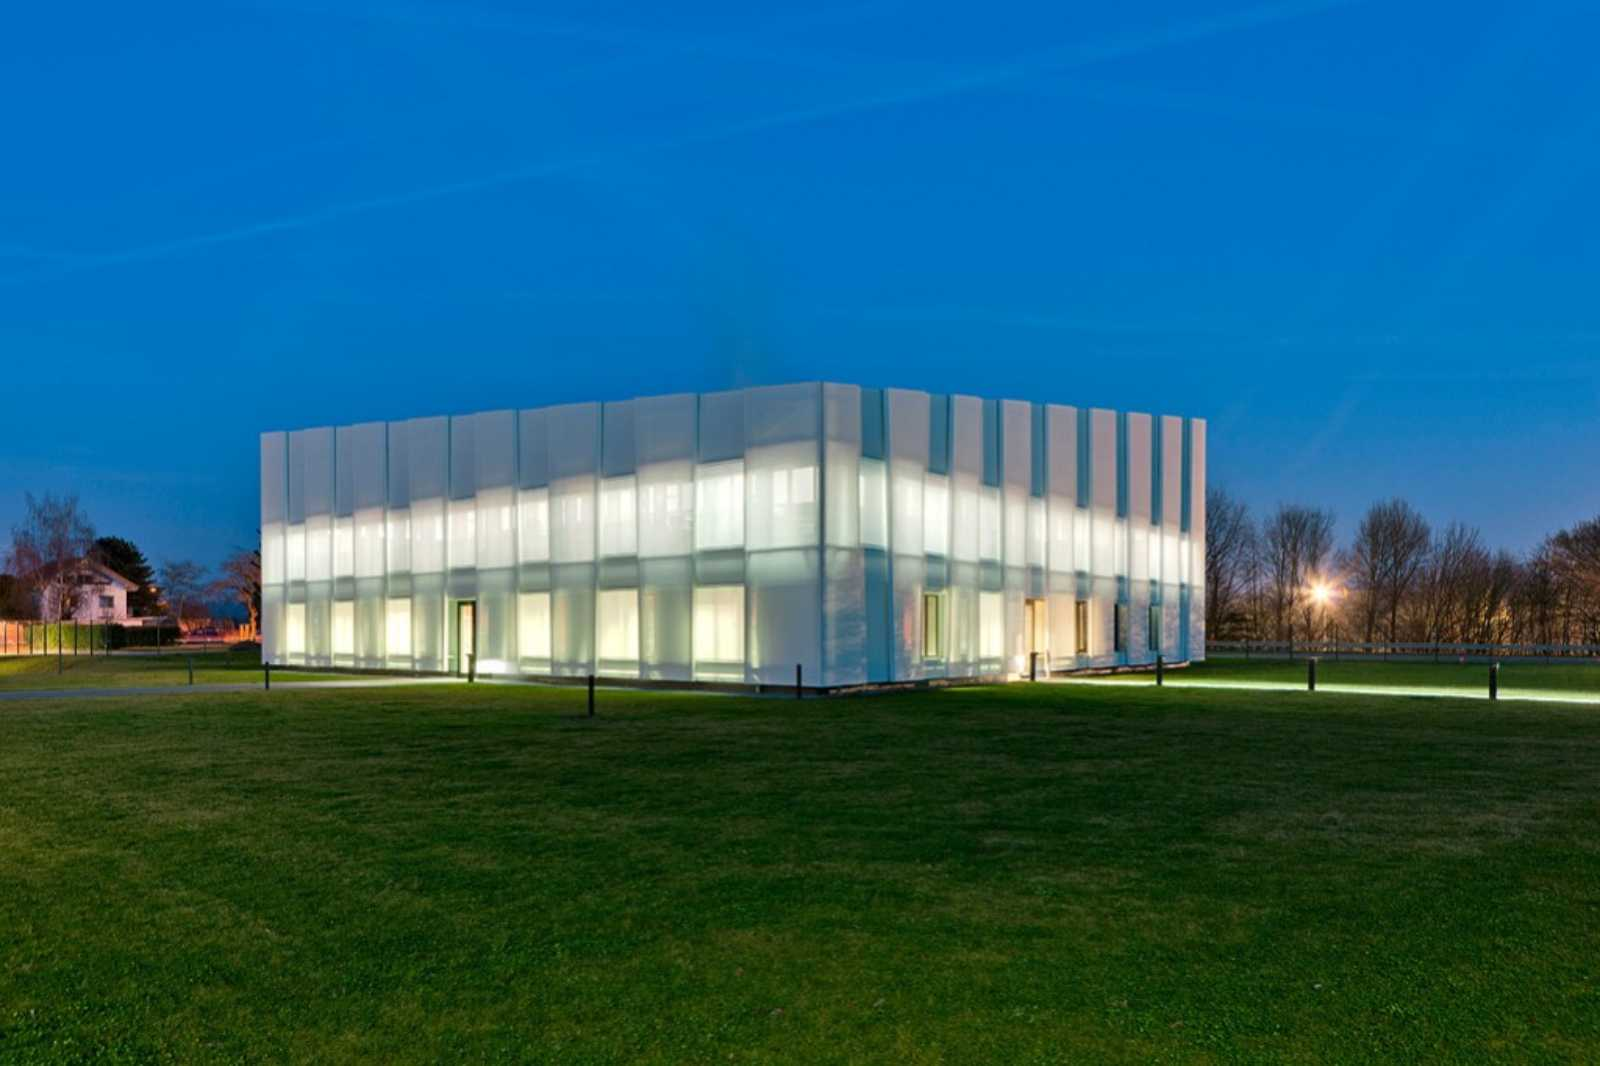 Sedus stoll ag by ludloff ludloff architekten for 03 architekten